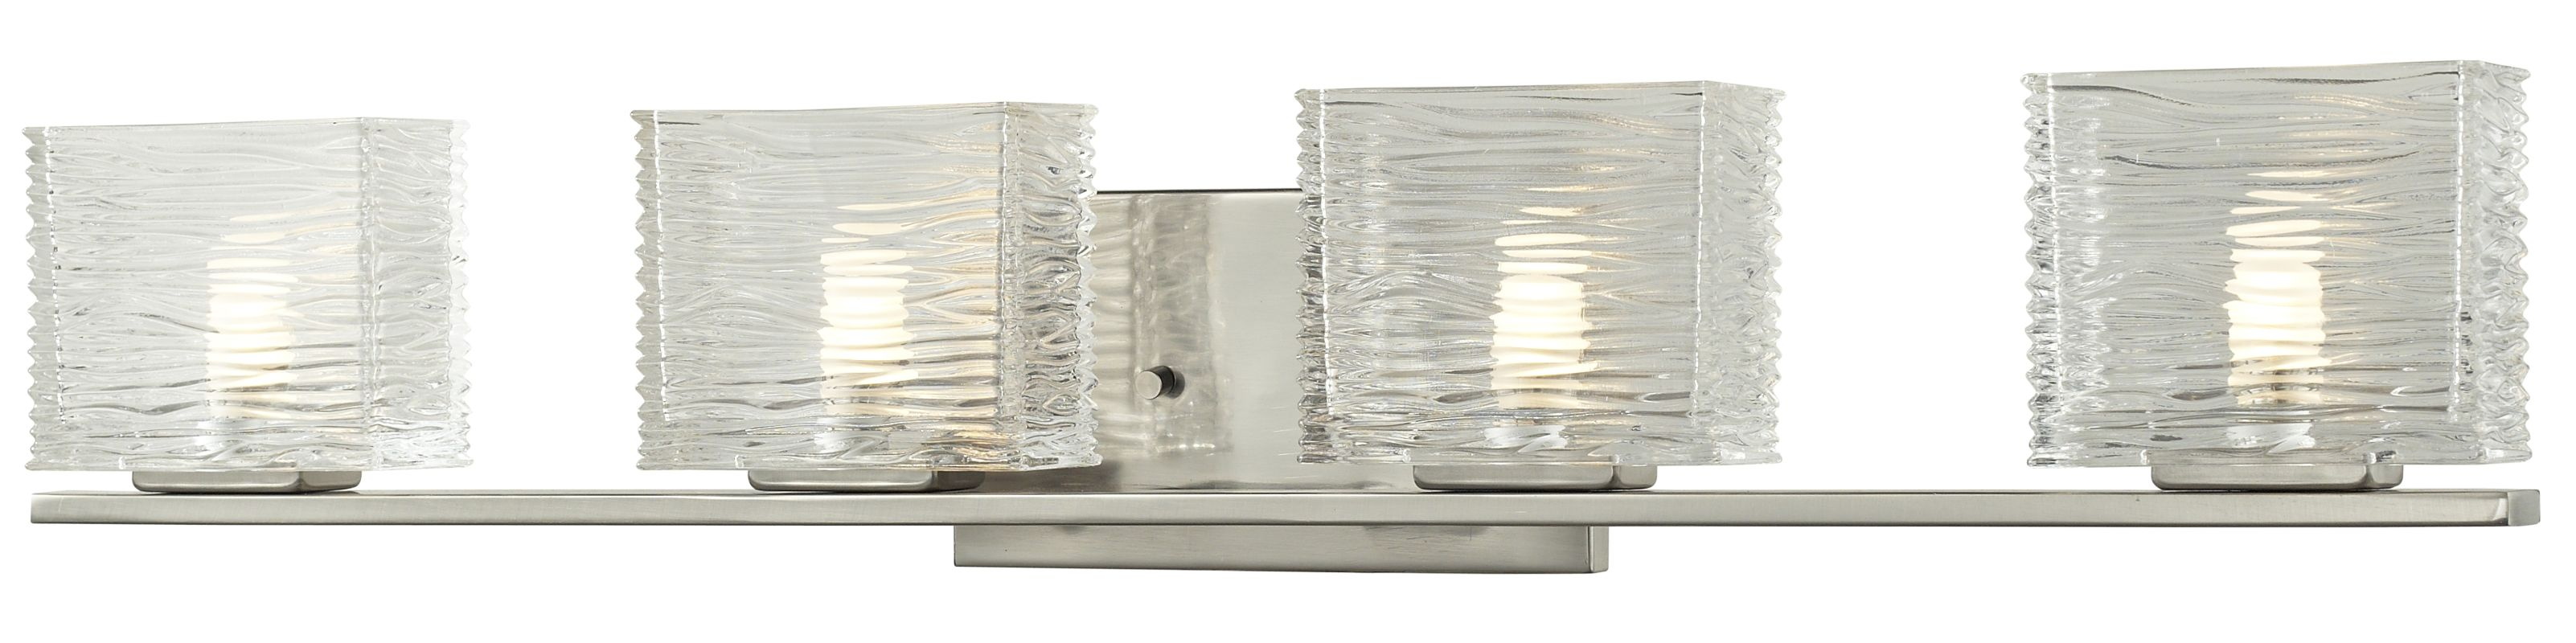 Z-Lite 3024-4V Jaol 4 Light ADA Compliant Bathroom Vanity Light with